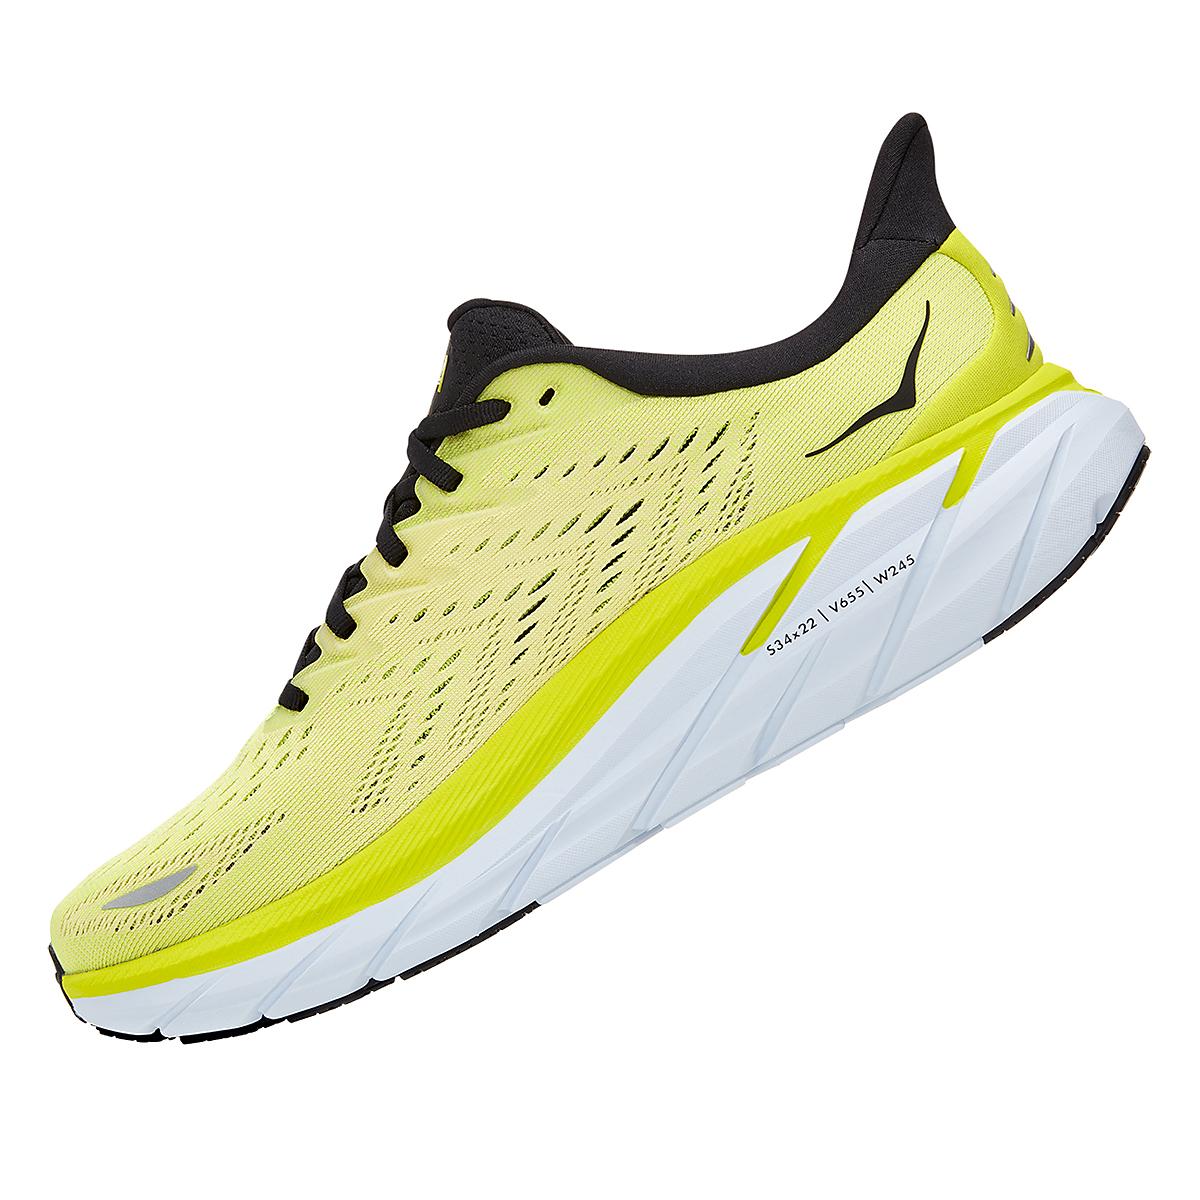 Men's Hoka One One Clifton 8 Running Shoe - Color: Evening Primrose/Charlock - Size: 7 - Width: Regular, Evening Primrose/Charlock, large, image 4